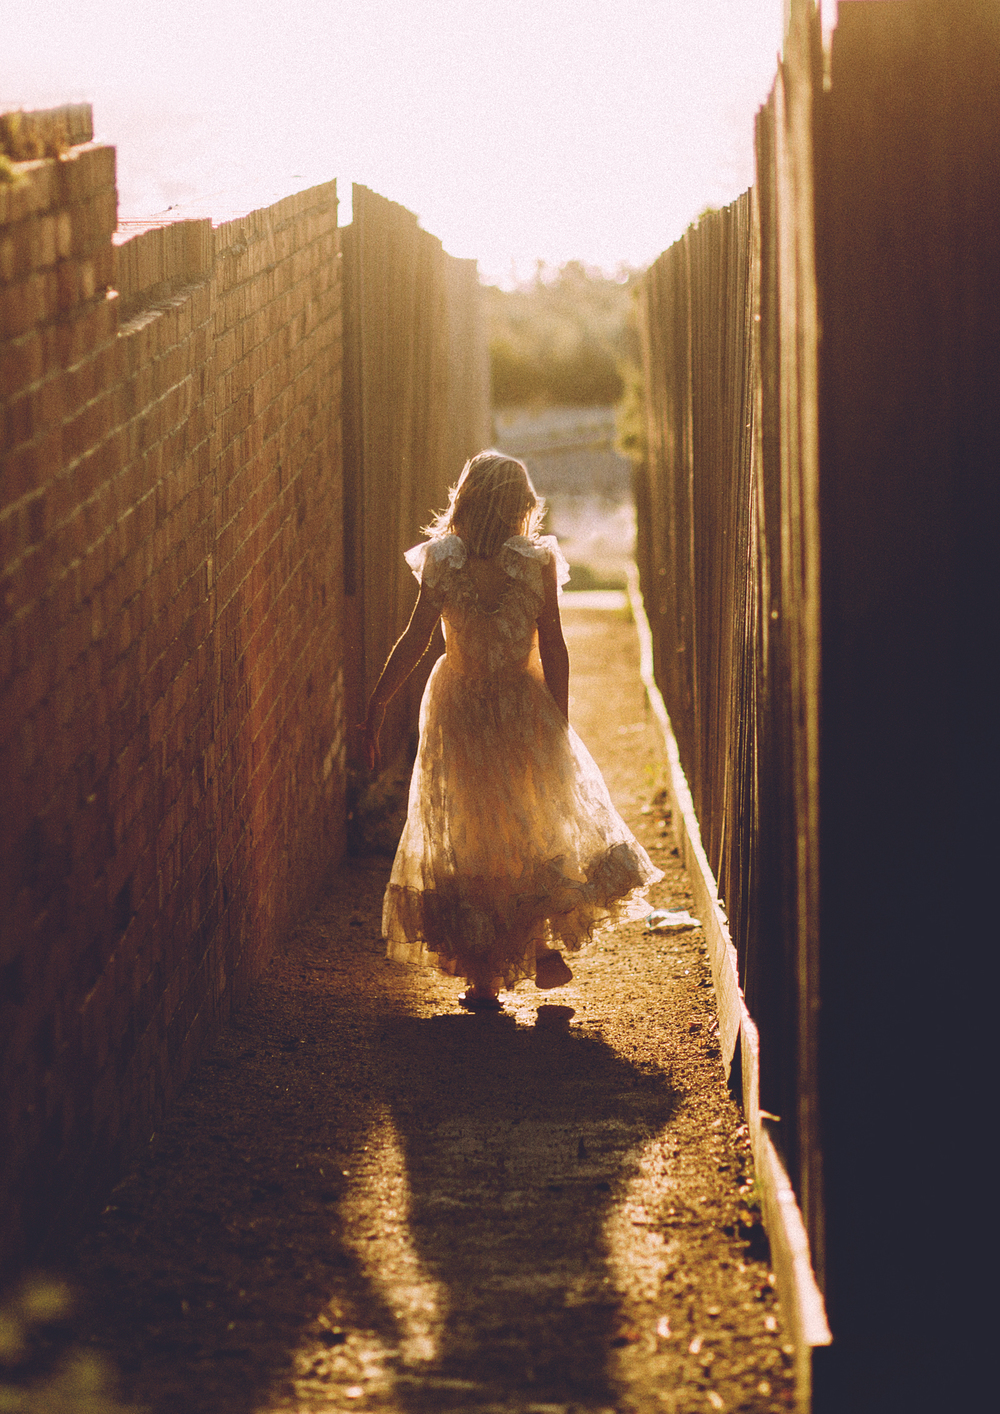 Little girl running down the laneway!